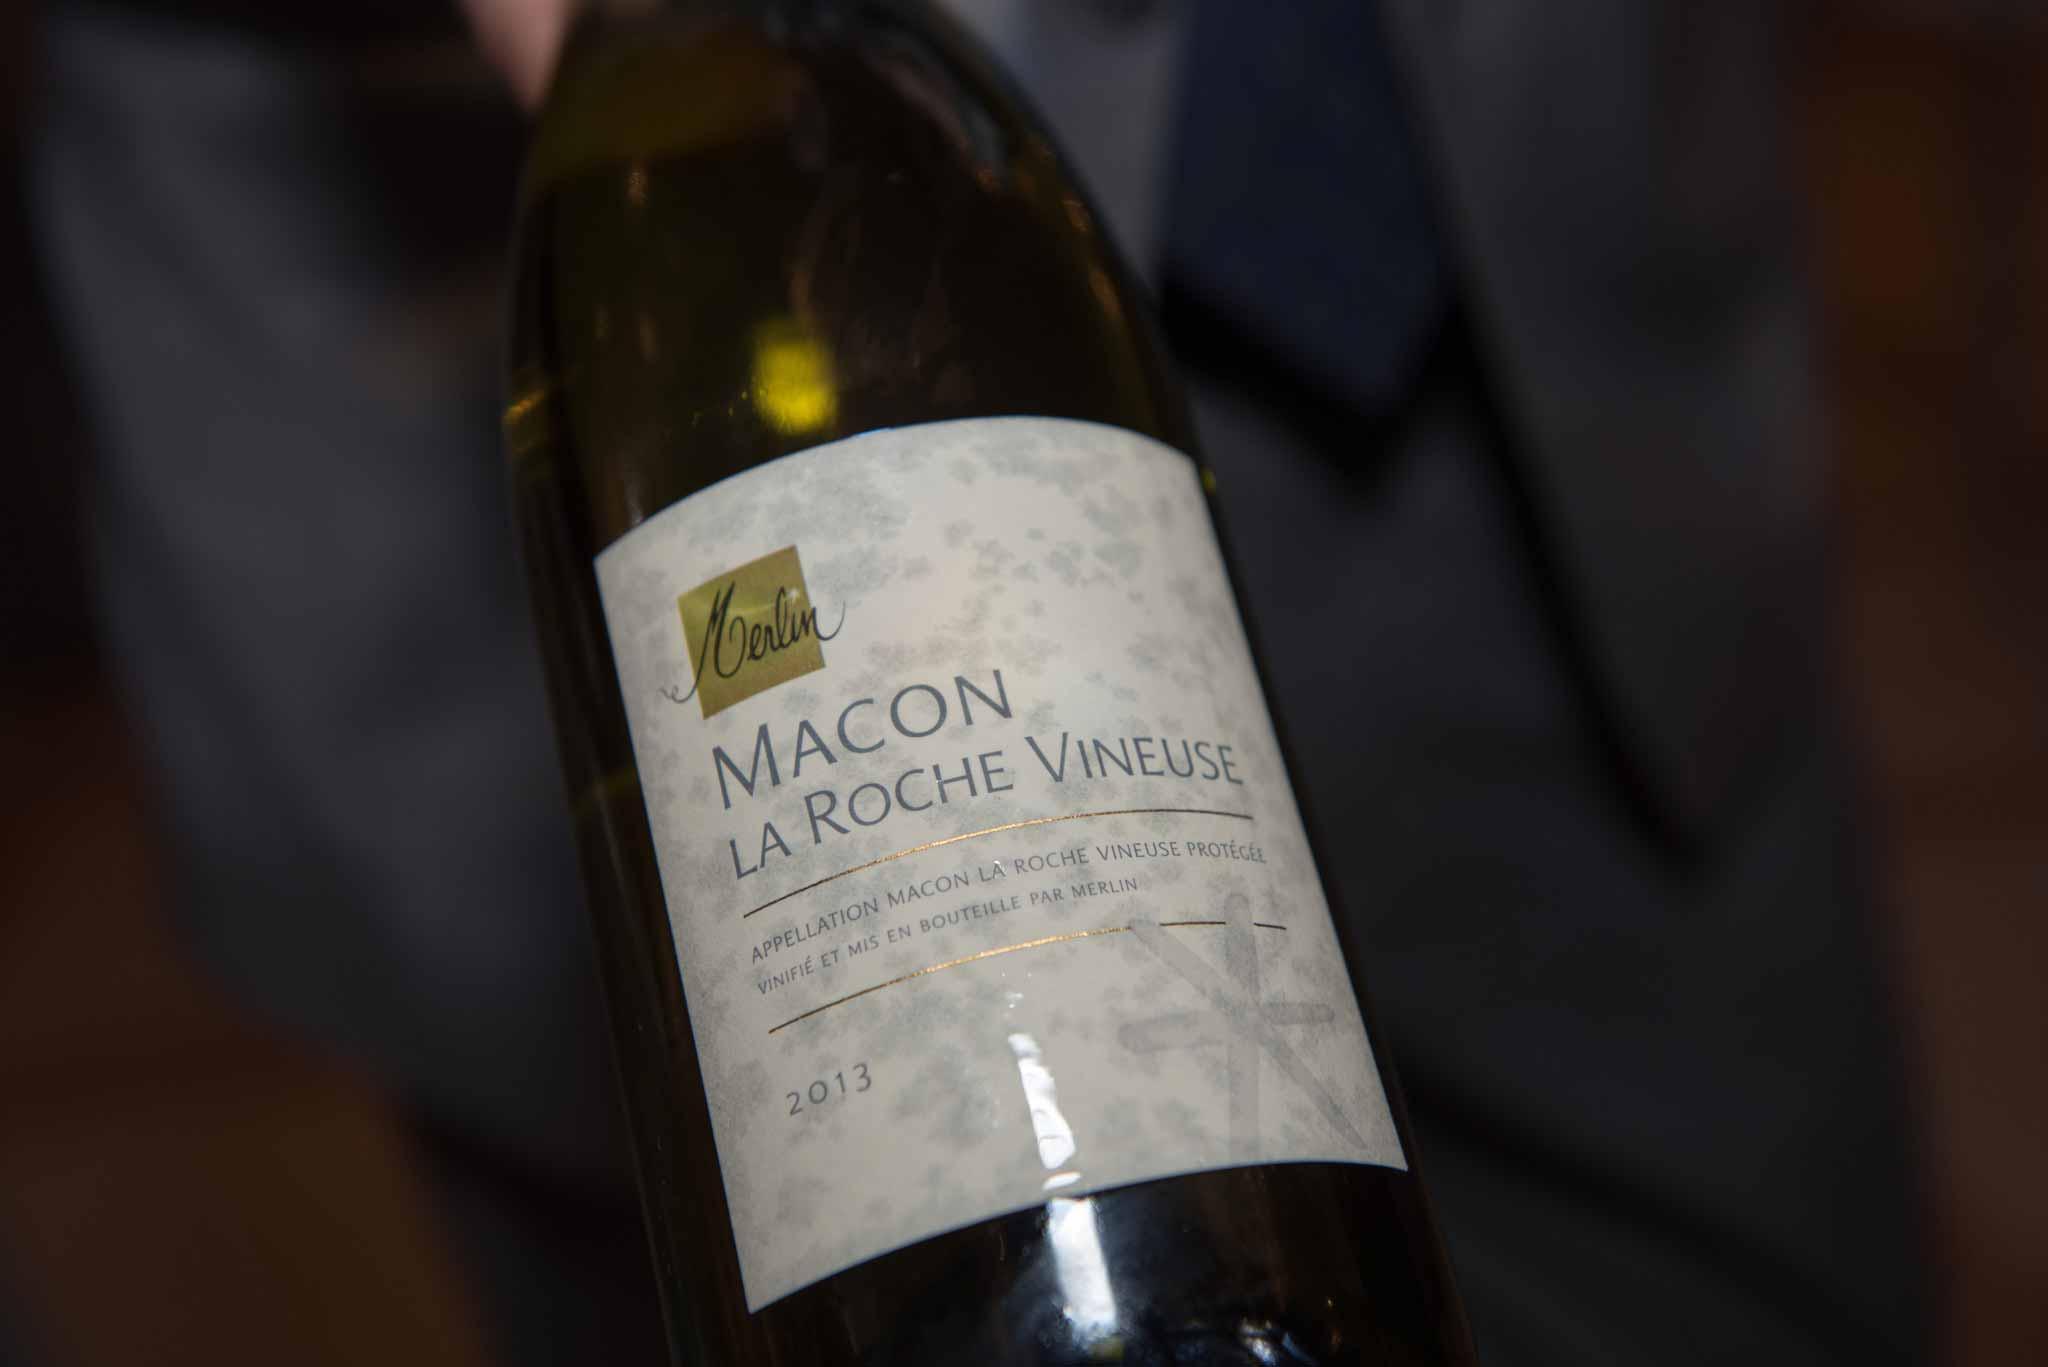 Macon La Roche Vineuse Merlin